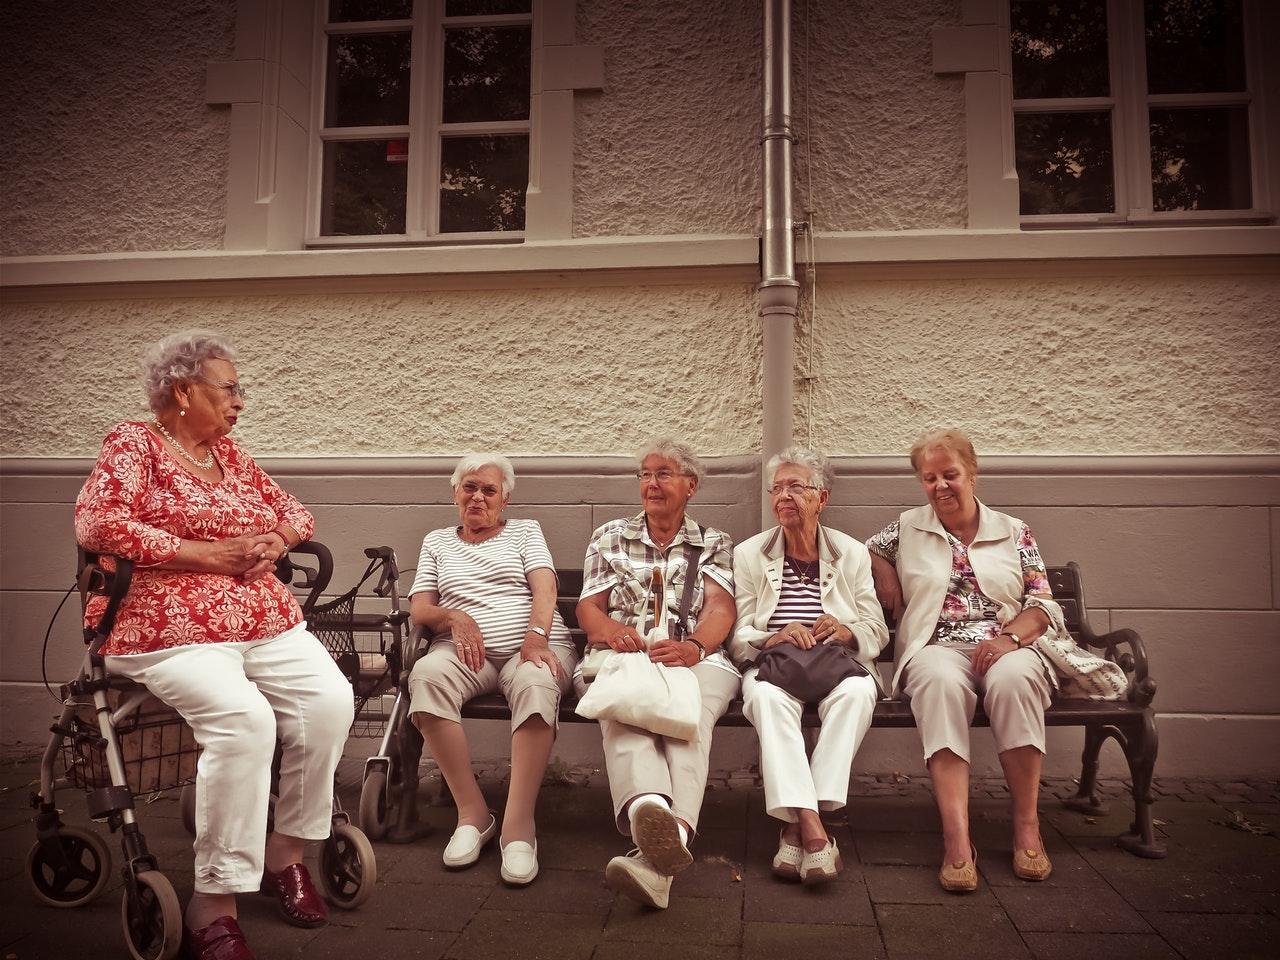 senior ladies on a bench.jpeg